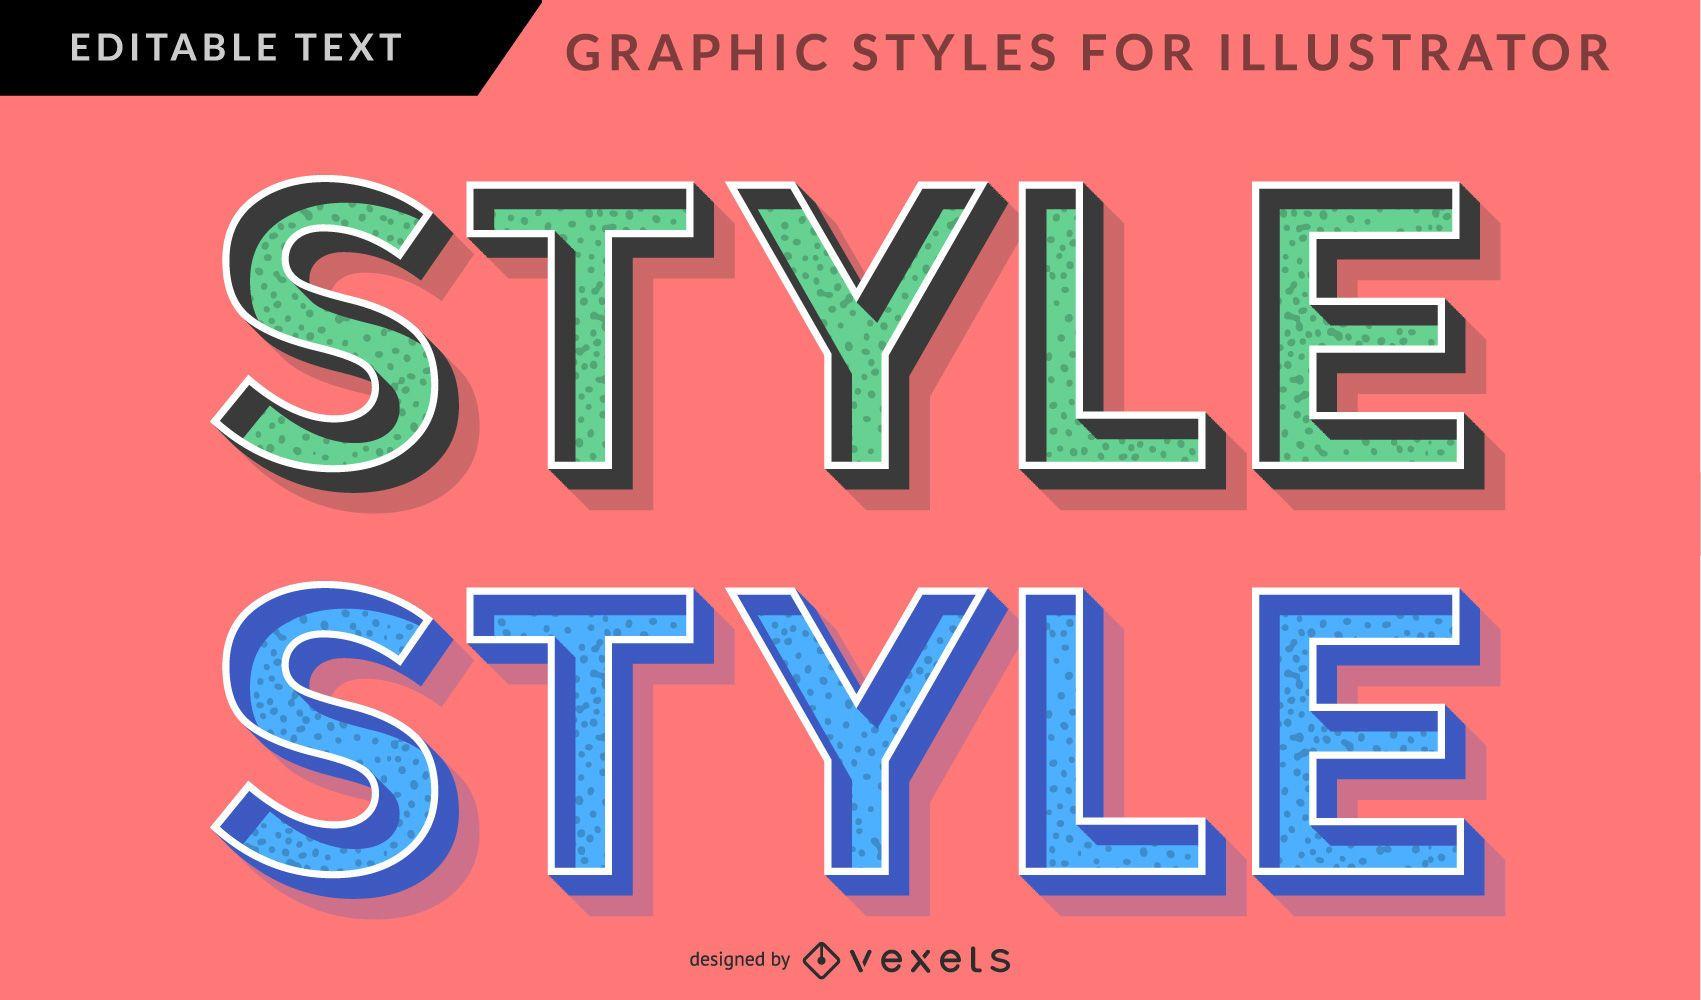 3D Retro Graphic Style